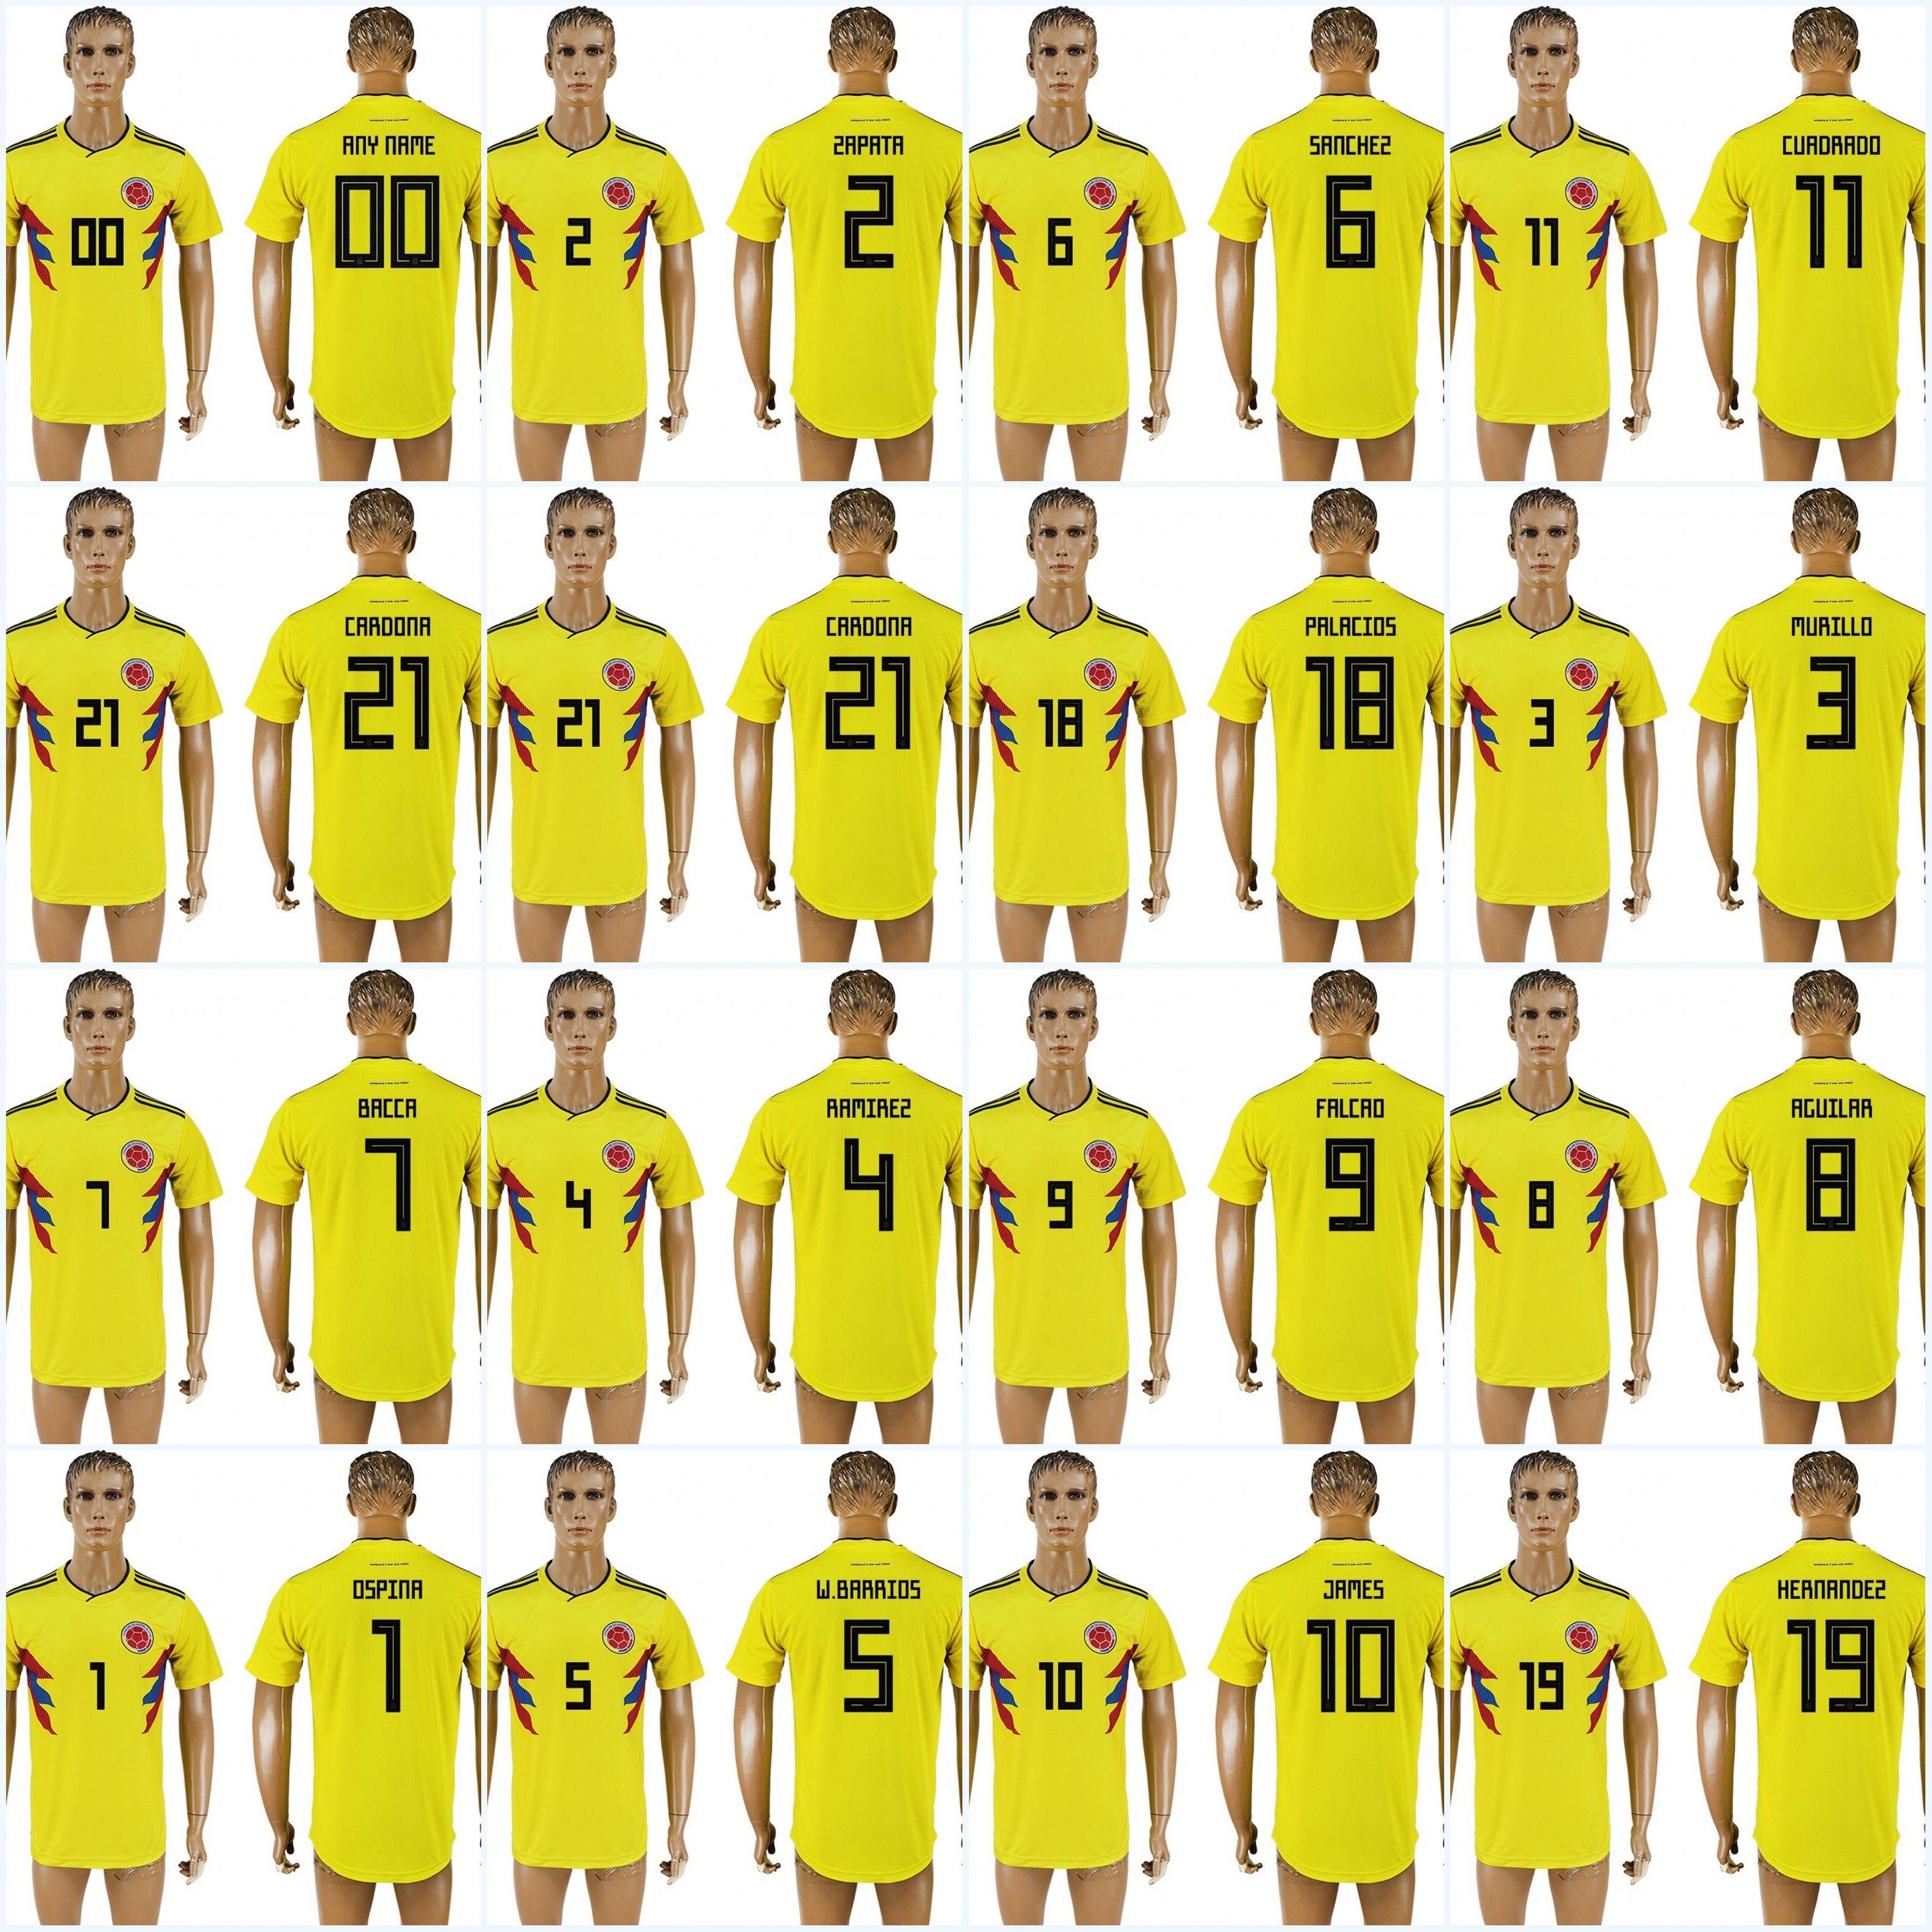 ab2cb046122 ... shop james 2018 world cup colombia falcao 11 cuadrado 3 murillo 21  cardona 18 palacios 19